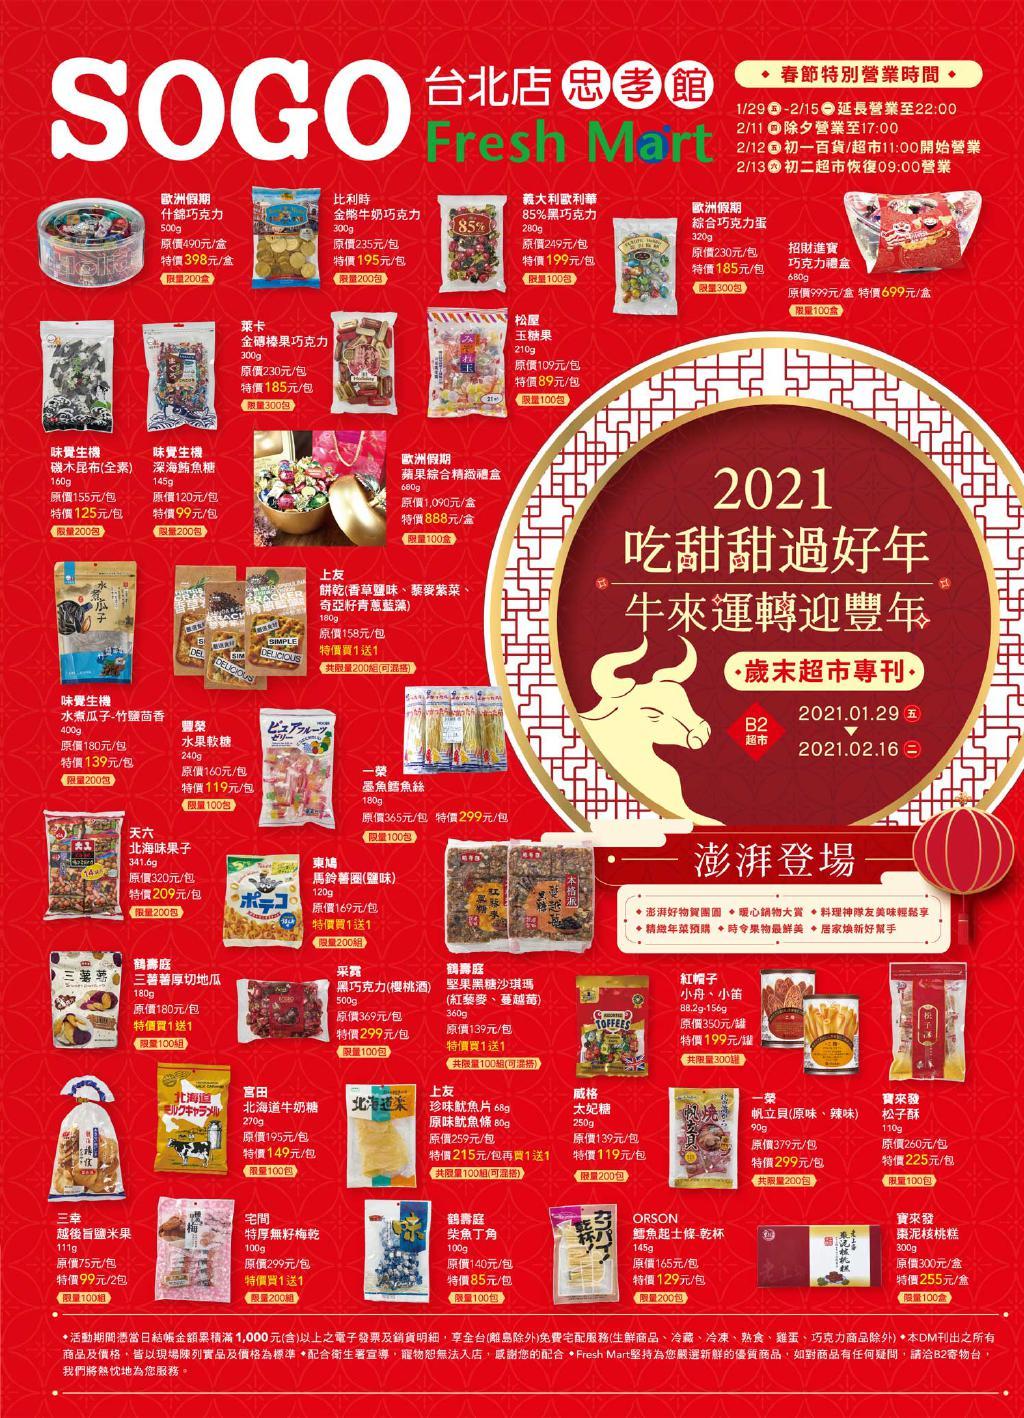 SOGO《台北忠孝館》DM 🛍B2 Fresh Mart【歲末超市專刊】🛍 【2021/2/16 止】